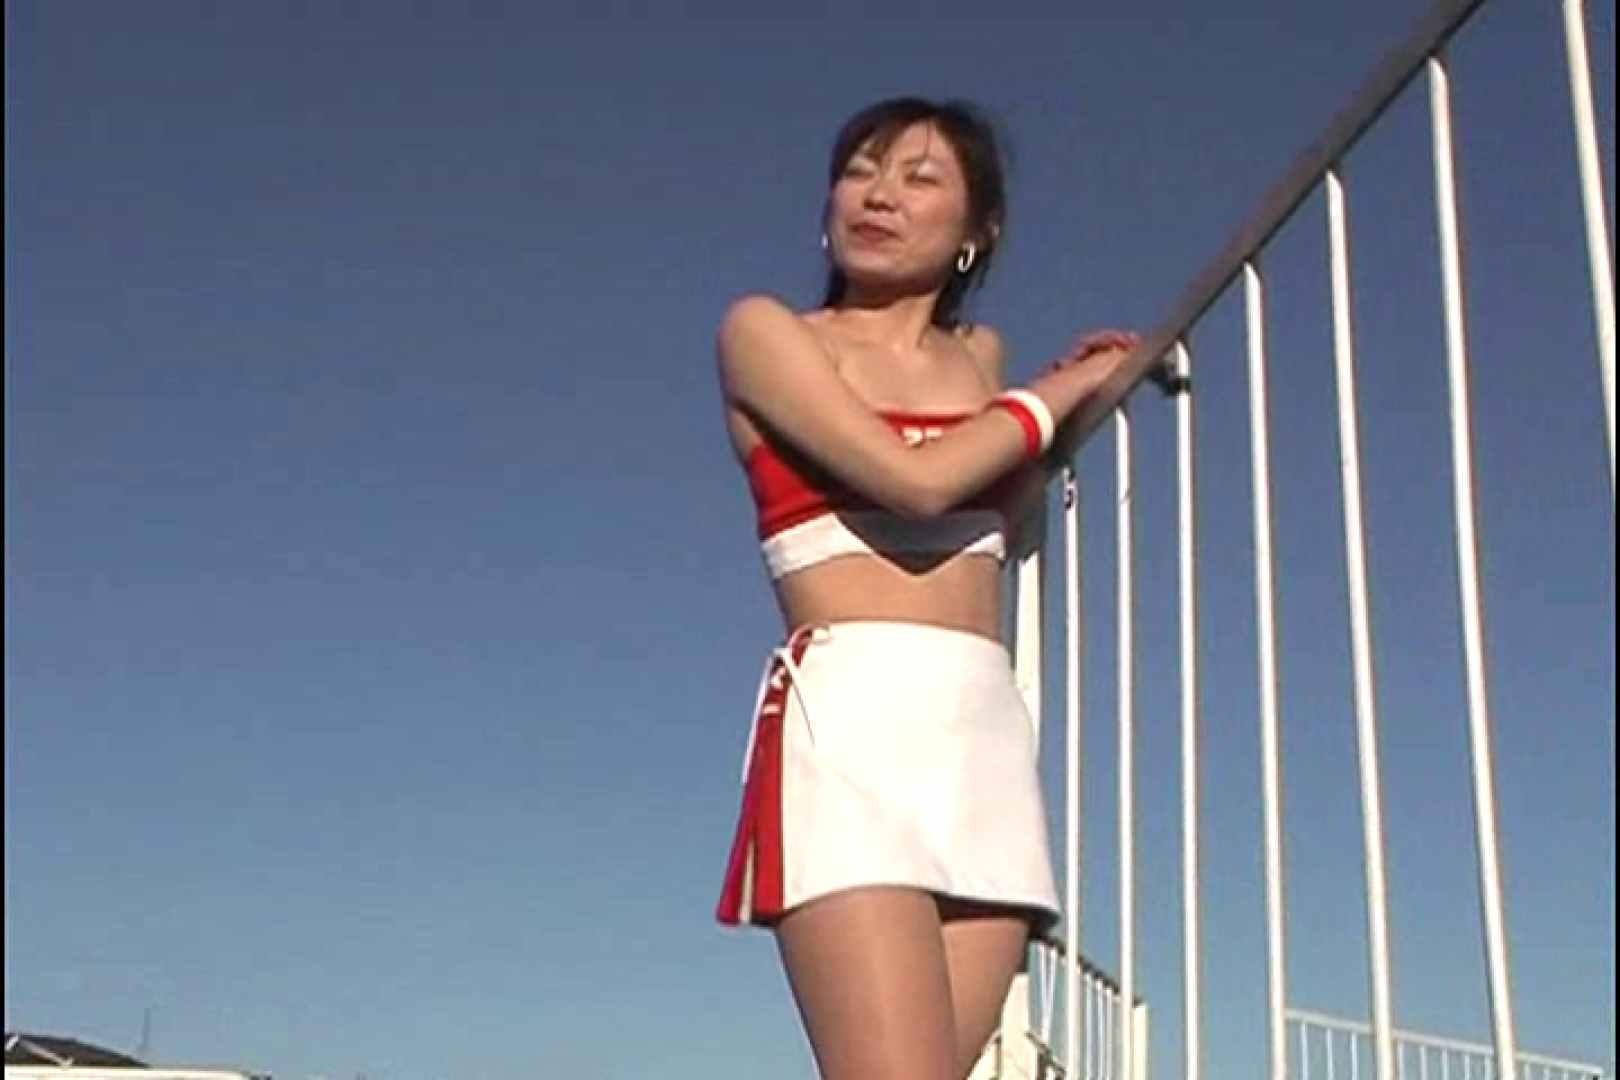 RQカメラ地獄Vol.11 レースクイーン編 セックス無修正動画無料 86画像 71